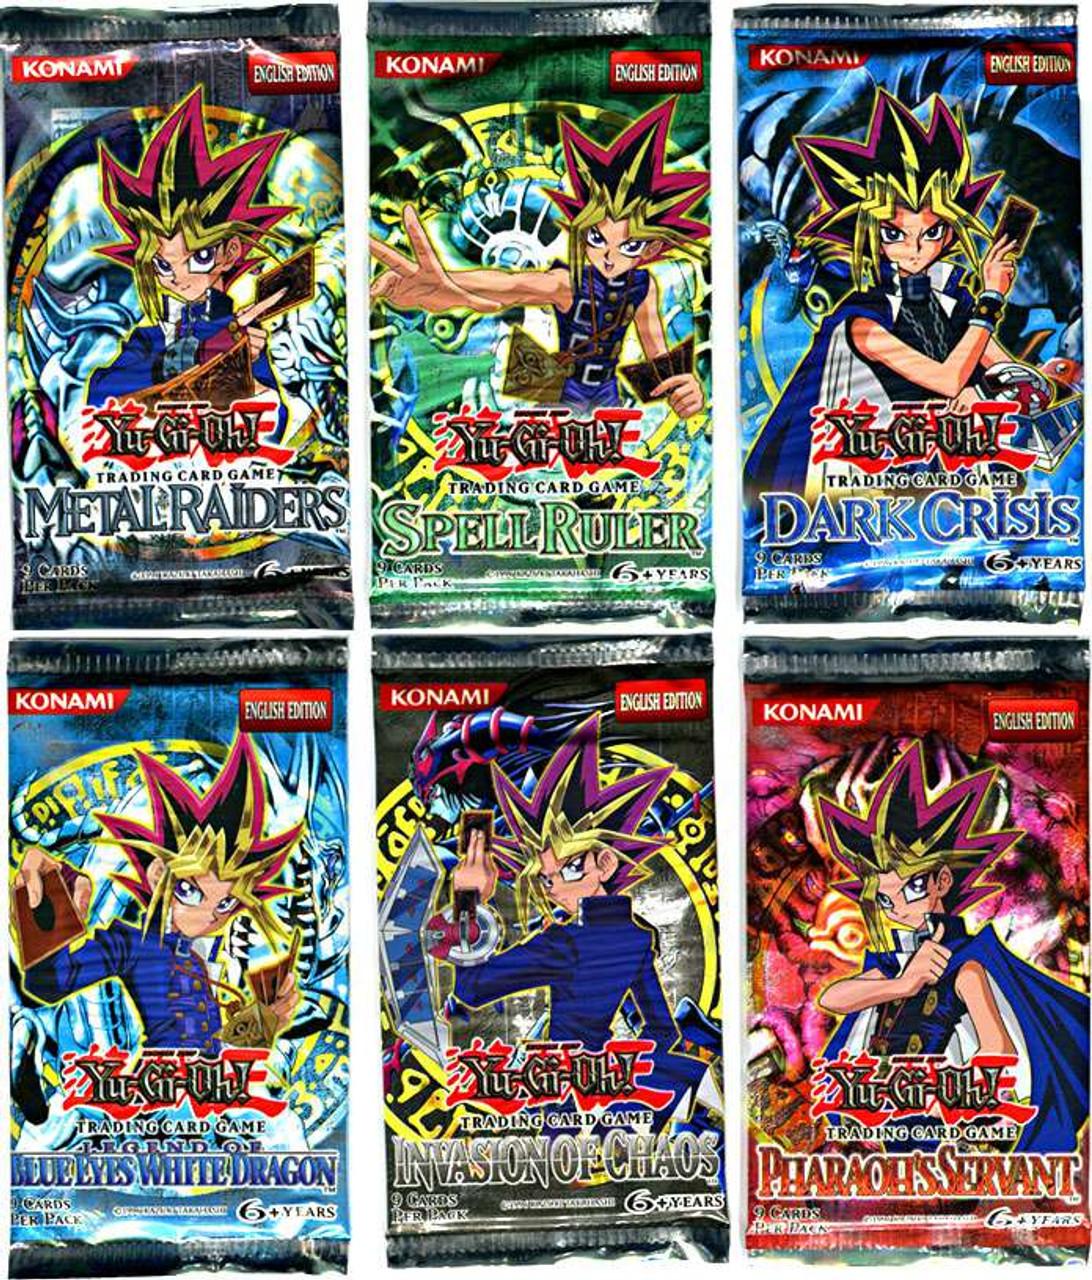 YuGiOh Invasion of Chaos, BEWD, Dark Crisis, Metal Raiders, Spell Ruler & Pharaoh's Servant LOT of 6 Booster Packs